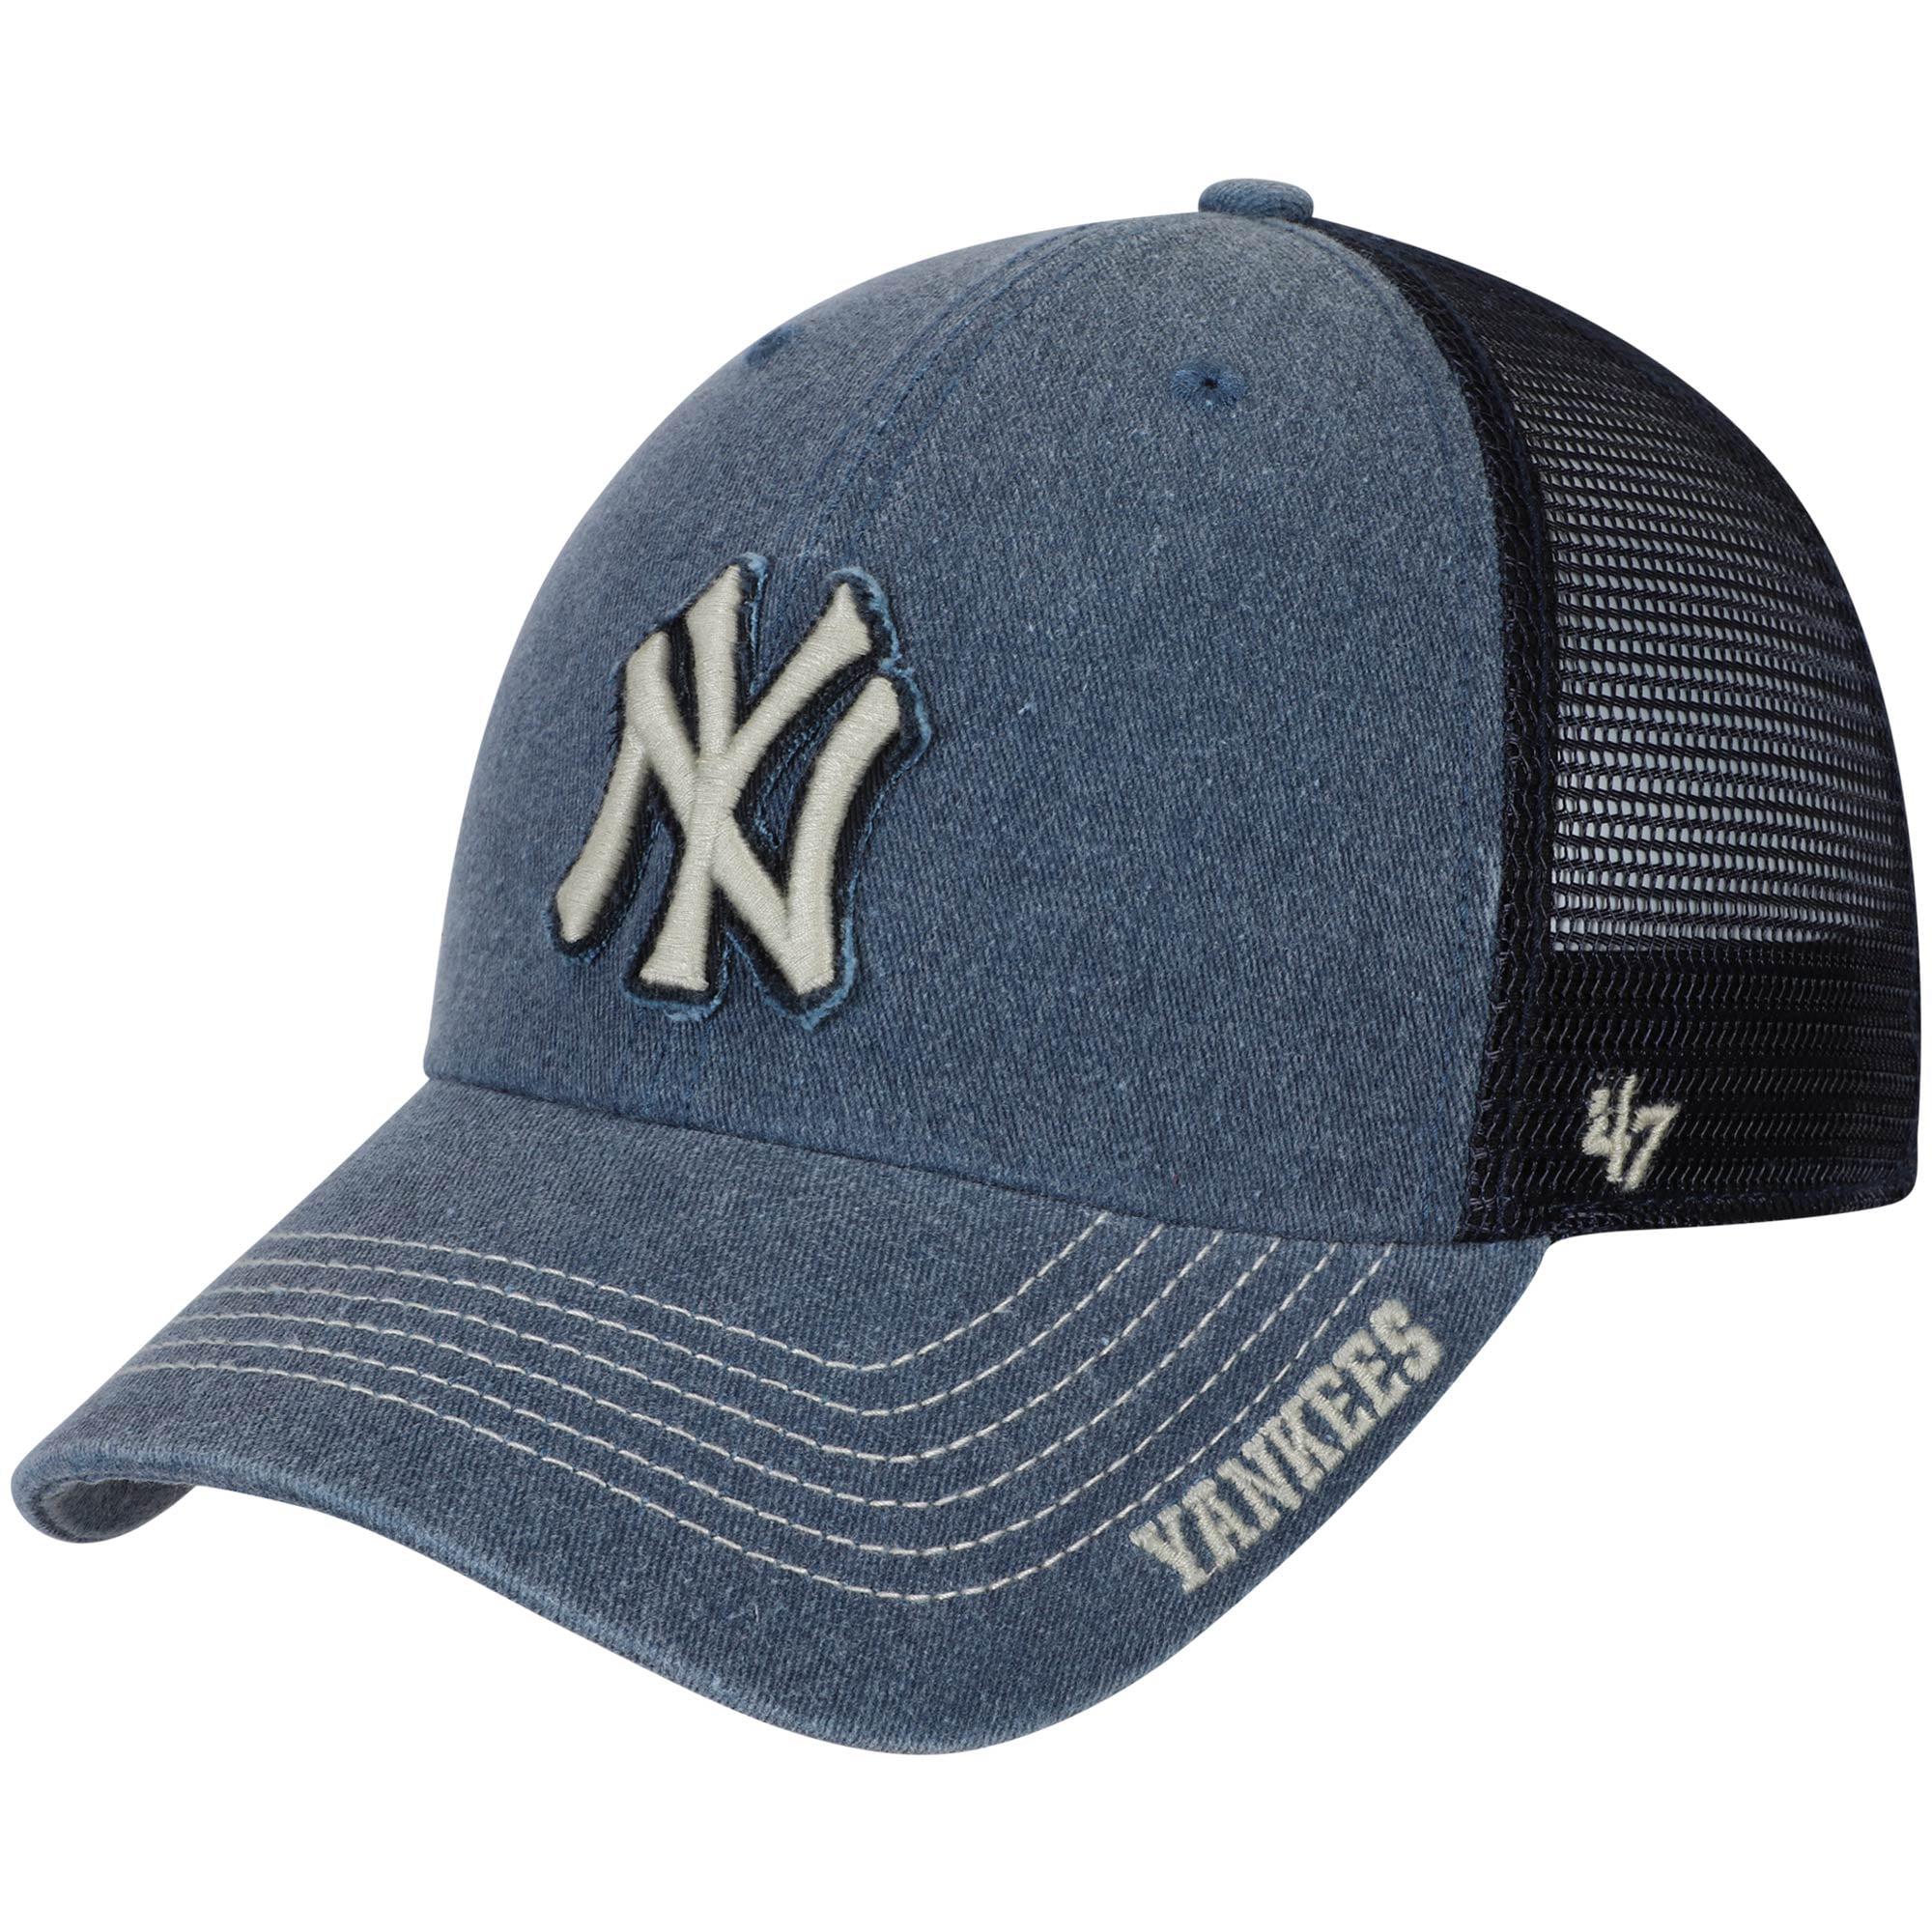 New York Yankees '47 Burnstead Clean Up Trucker Adjustable Hat - Navy - OSFA